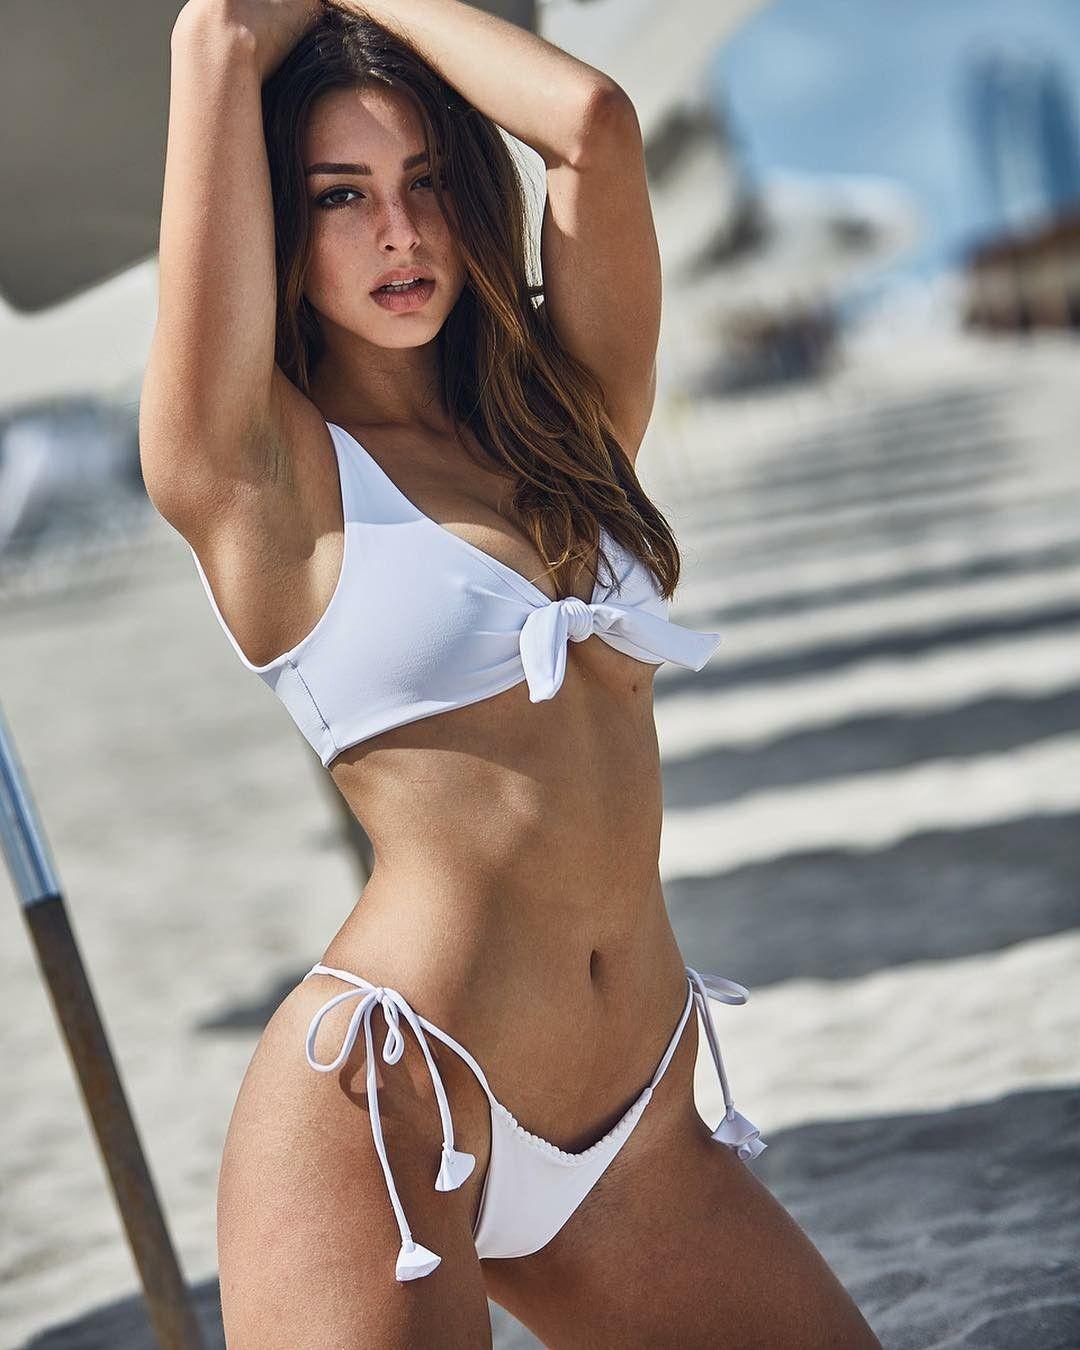 Bikini Celine Farach naked (87 photo), Topless, Sideboobs, Twitter, underwear 2020